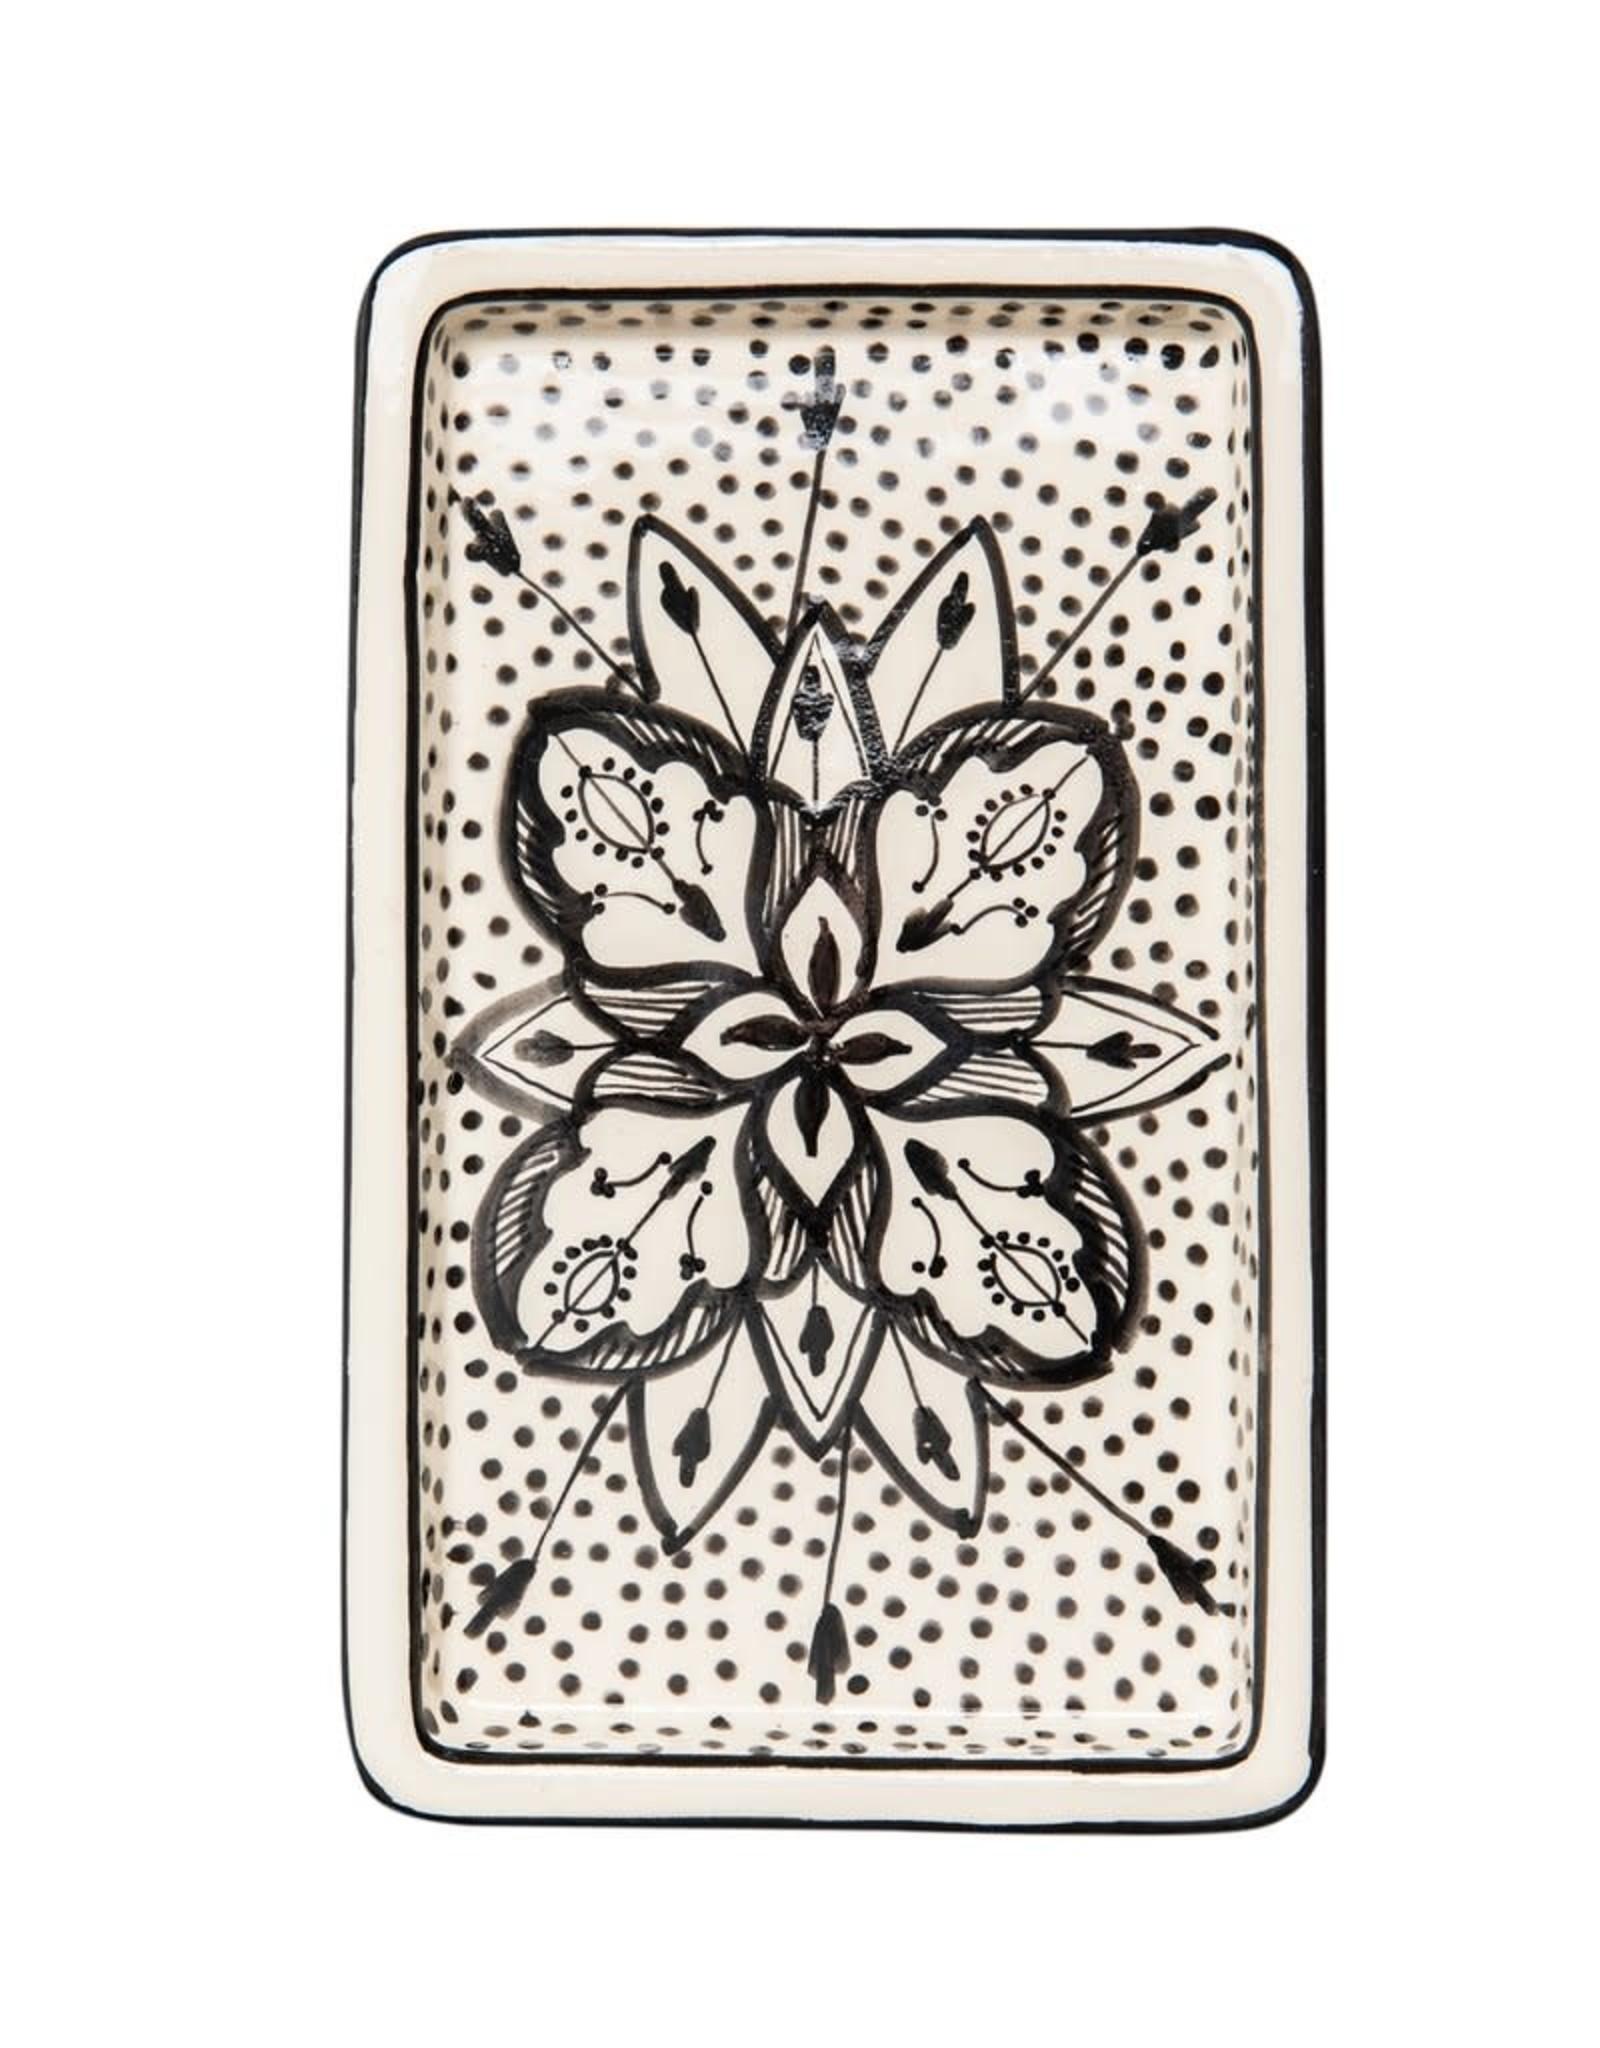 Rectangle Floral Ceramic Plate Black